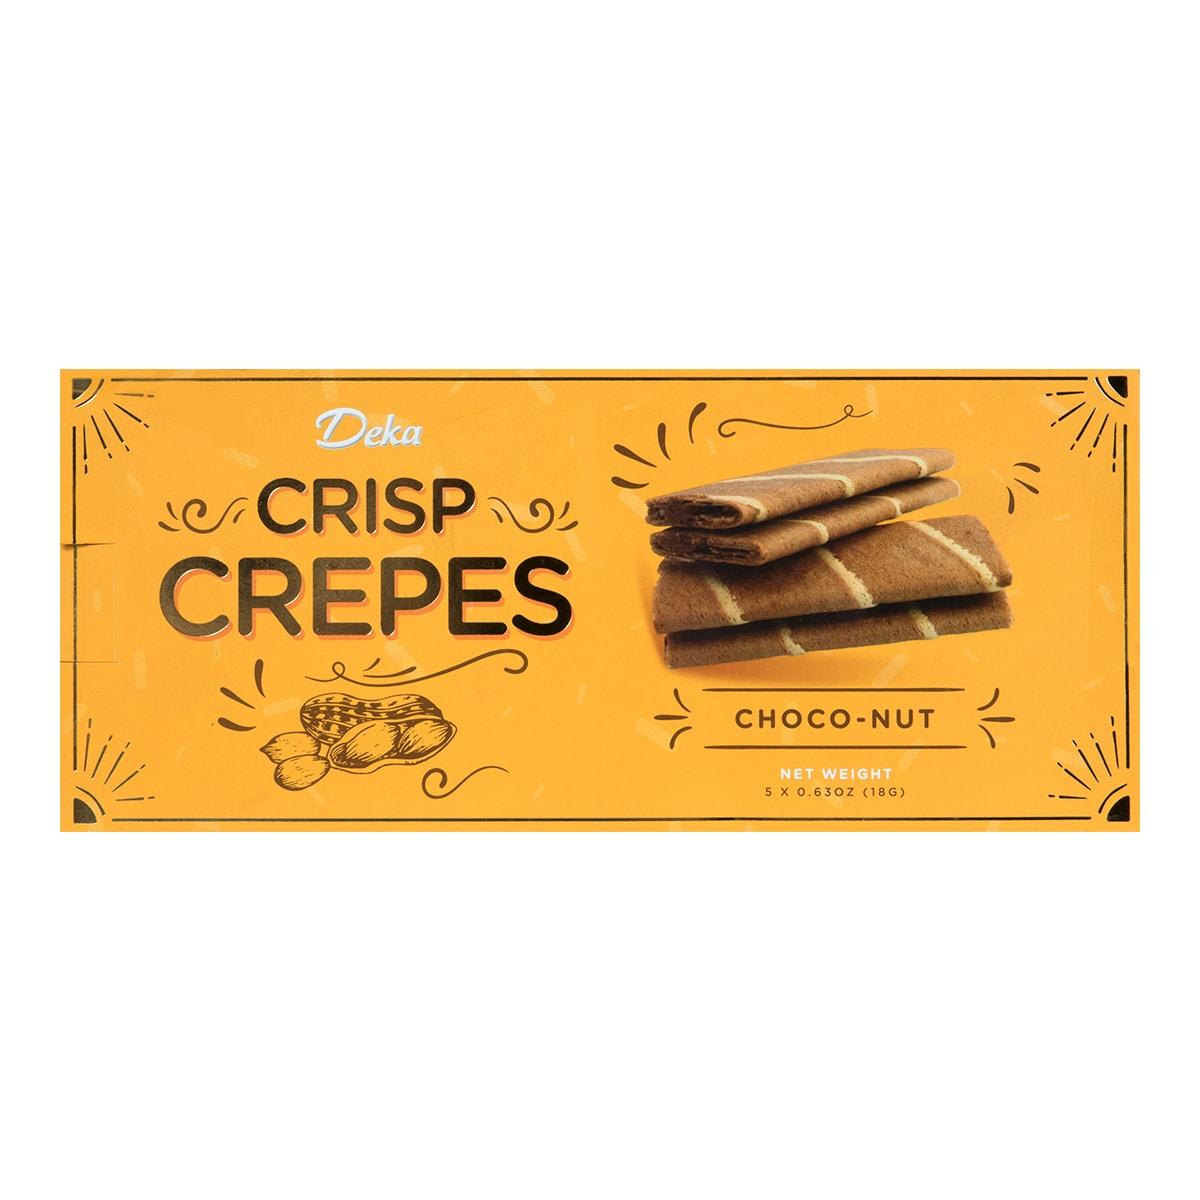 JANS Deka Choco-Nut Crisp Crepes 90g